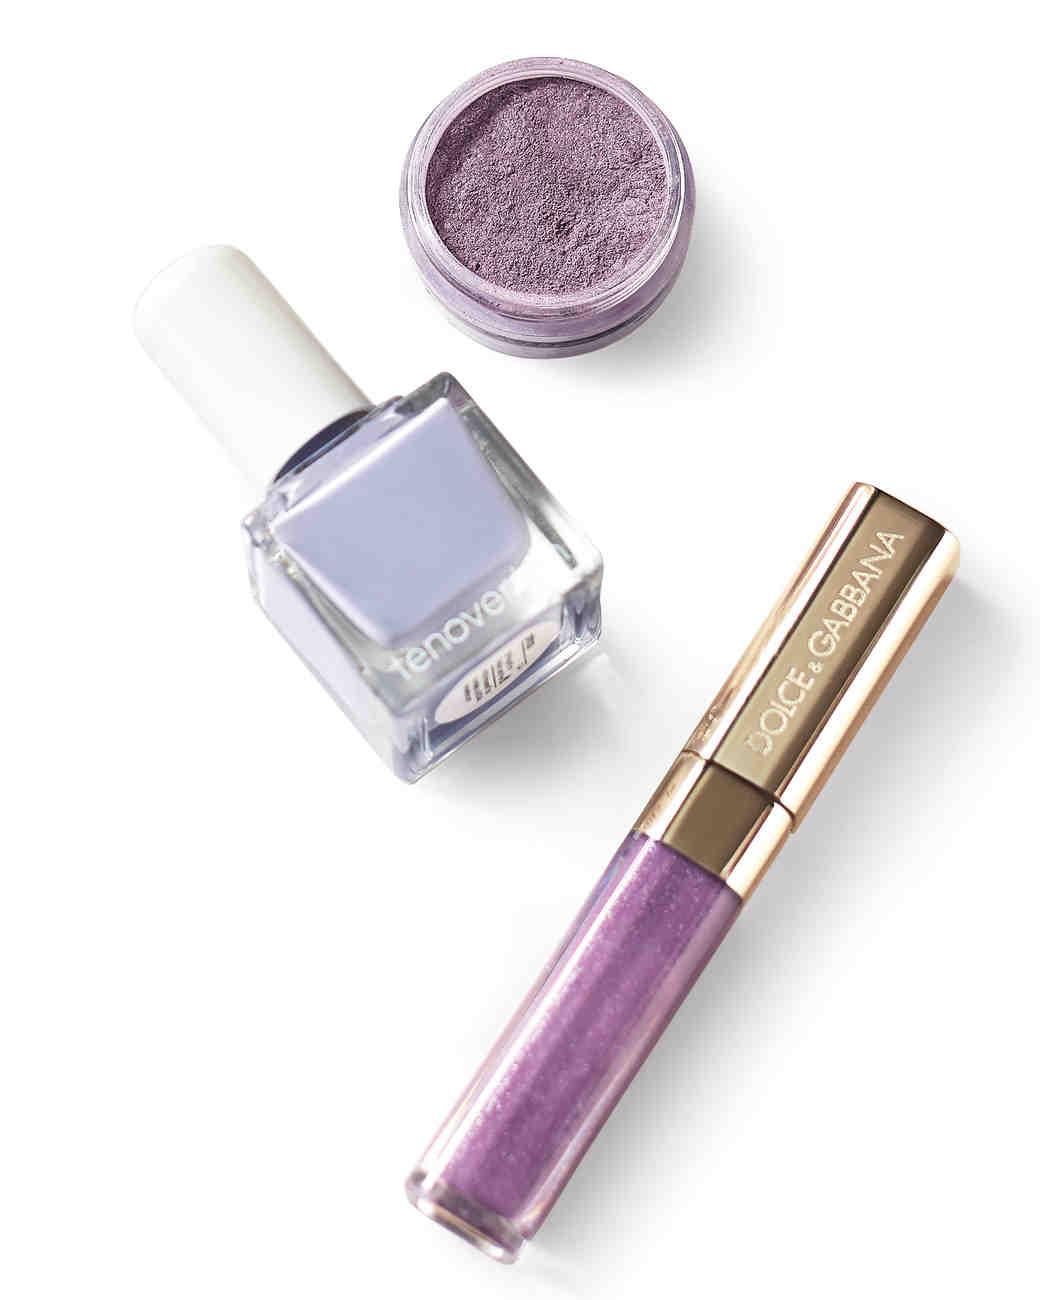 beauty-products-silos-614-mwd110998.jpg